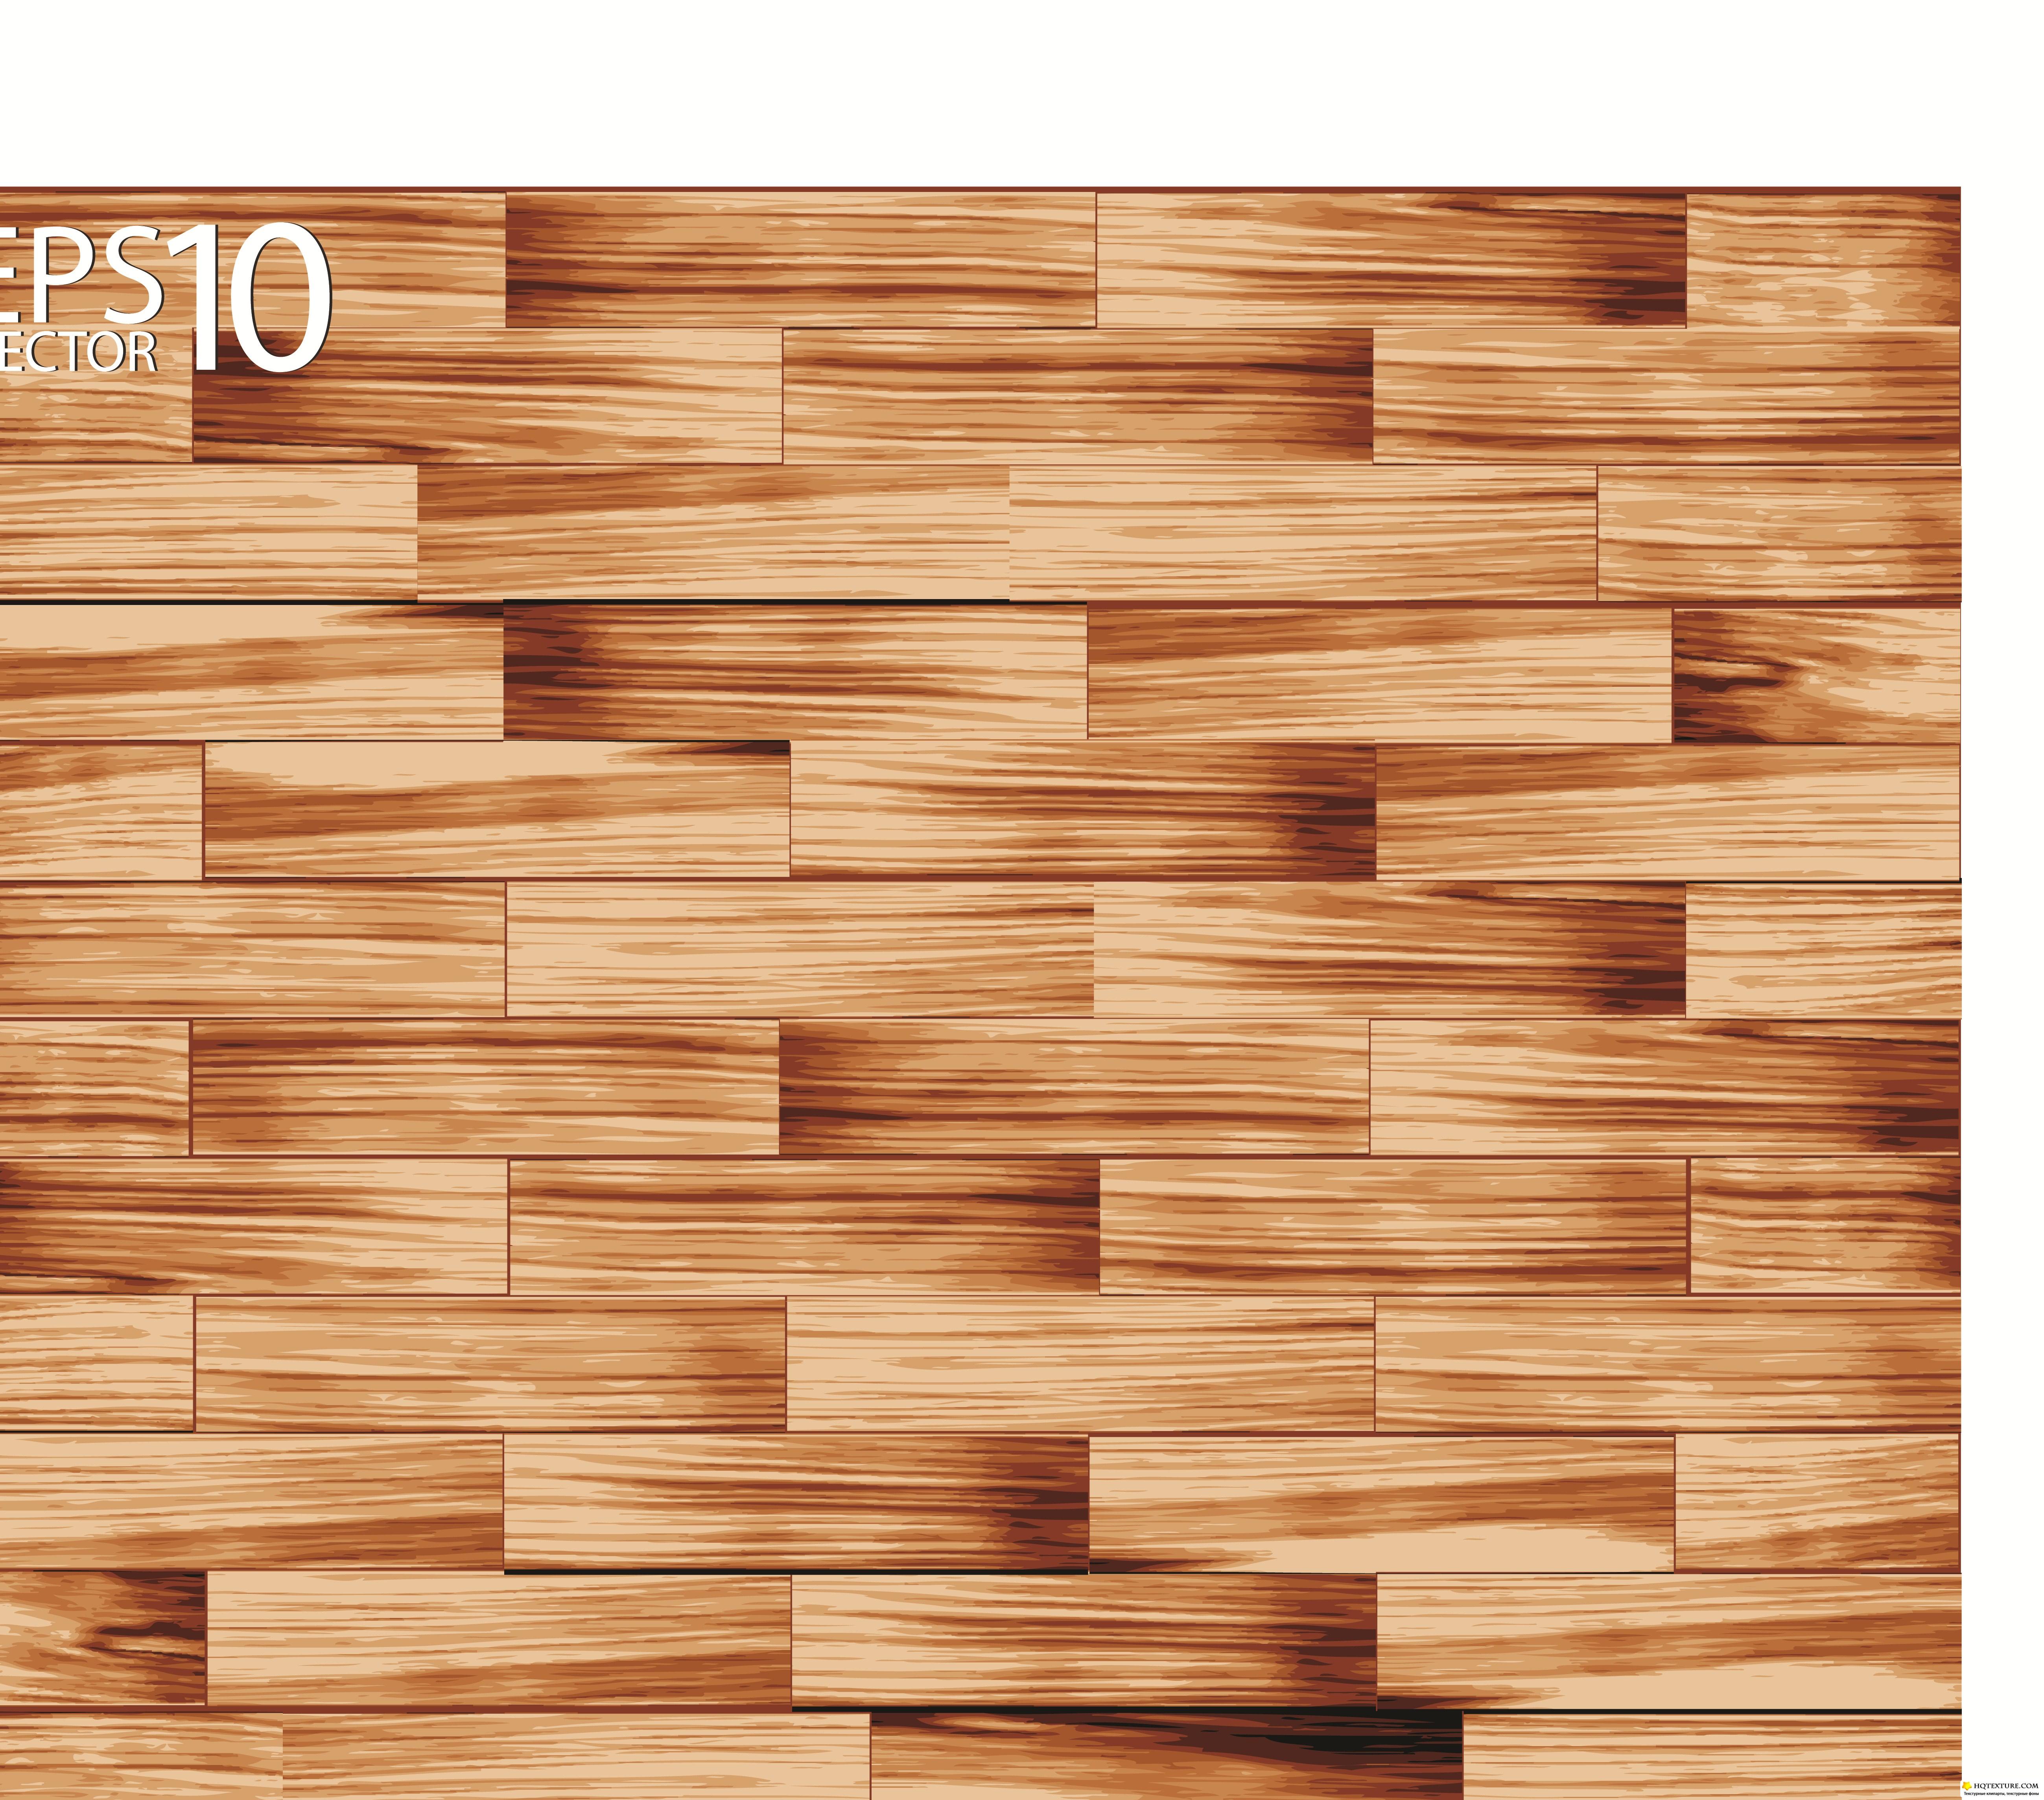 Wood Background Vectors Photos and PSD files  Freepik